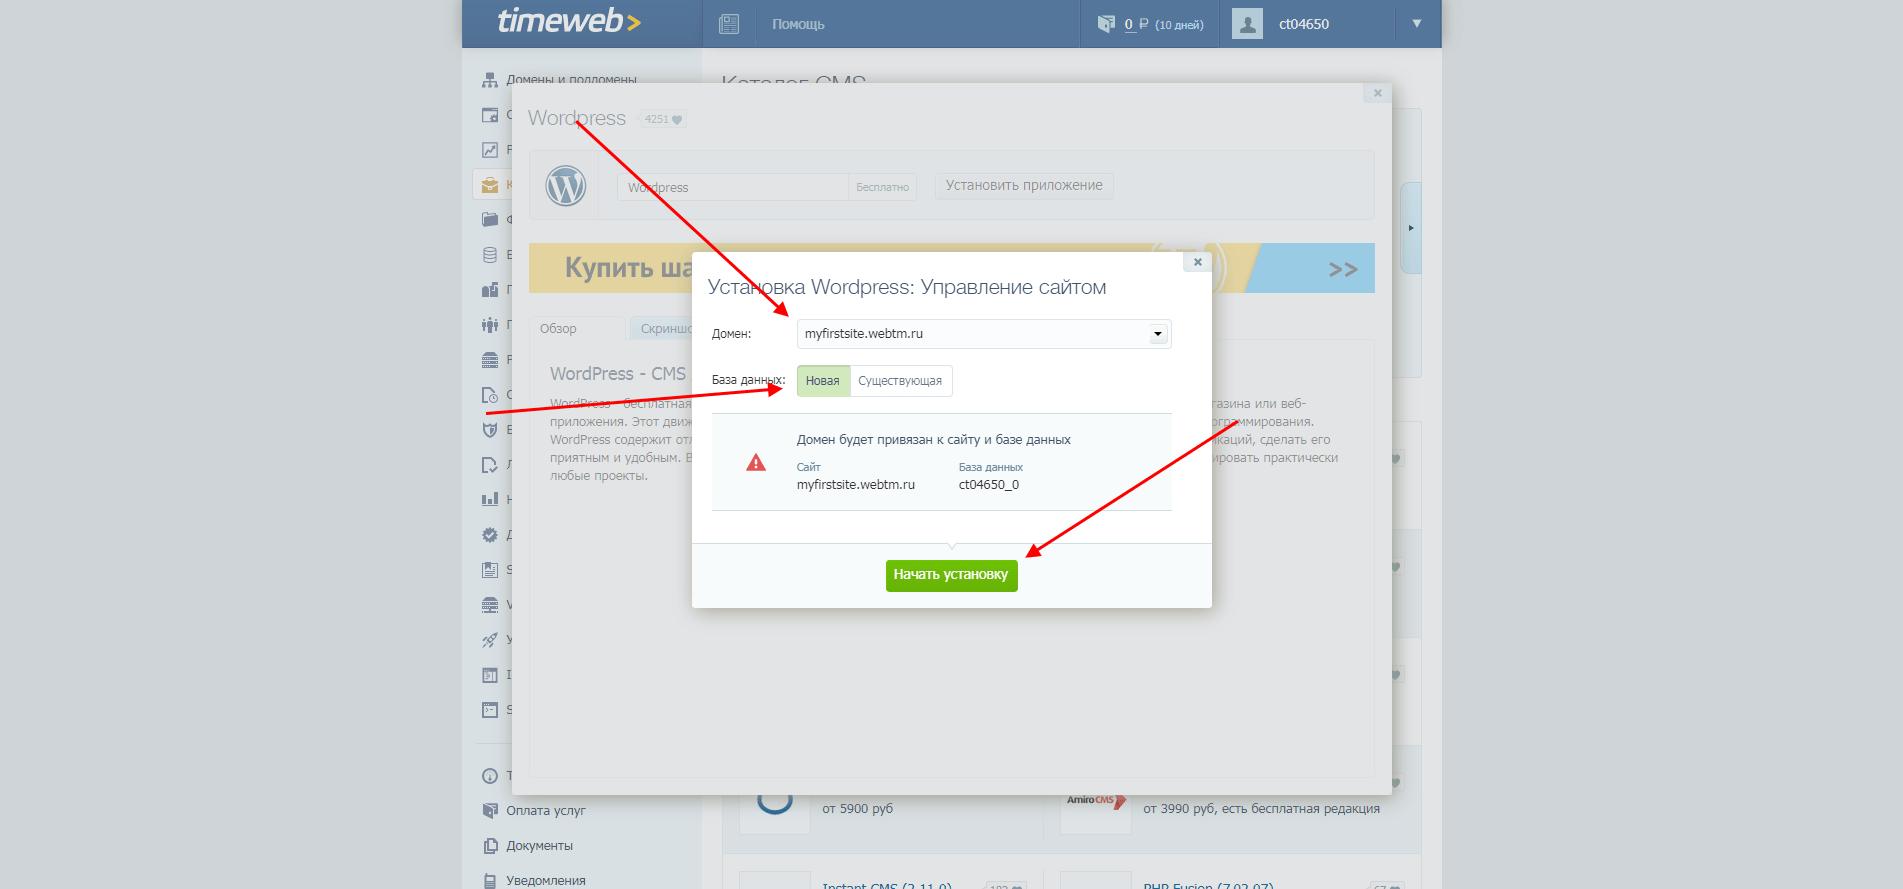 Bagaimana untuk menjadi tuan rumah Timeeweb untuk meletakkan WordPress